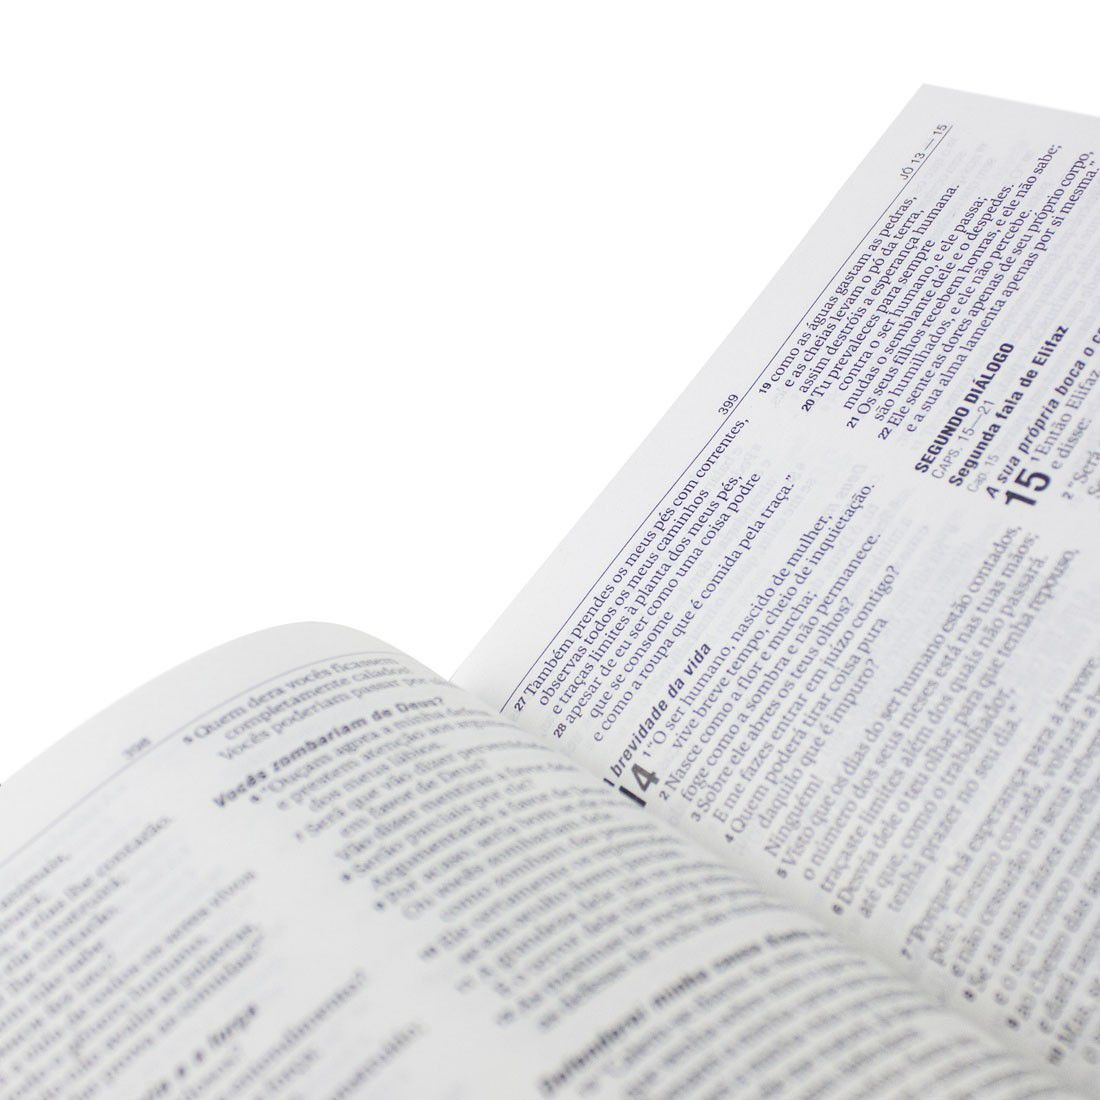 Bíblia Sagrada NAA Jovens (Leão)  - Livraria Betel